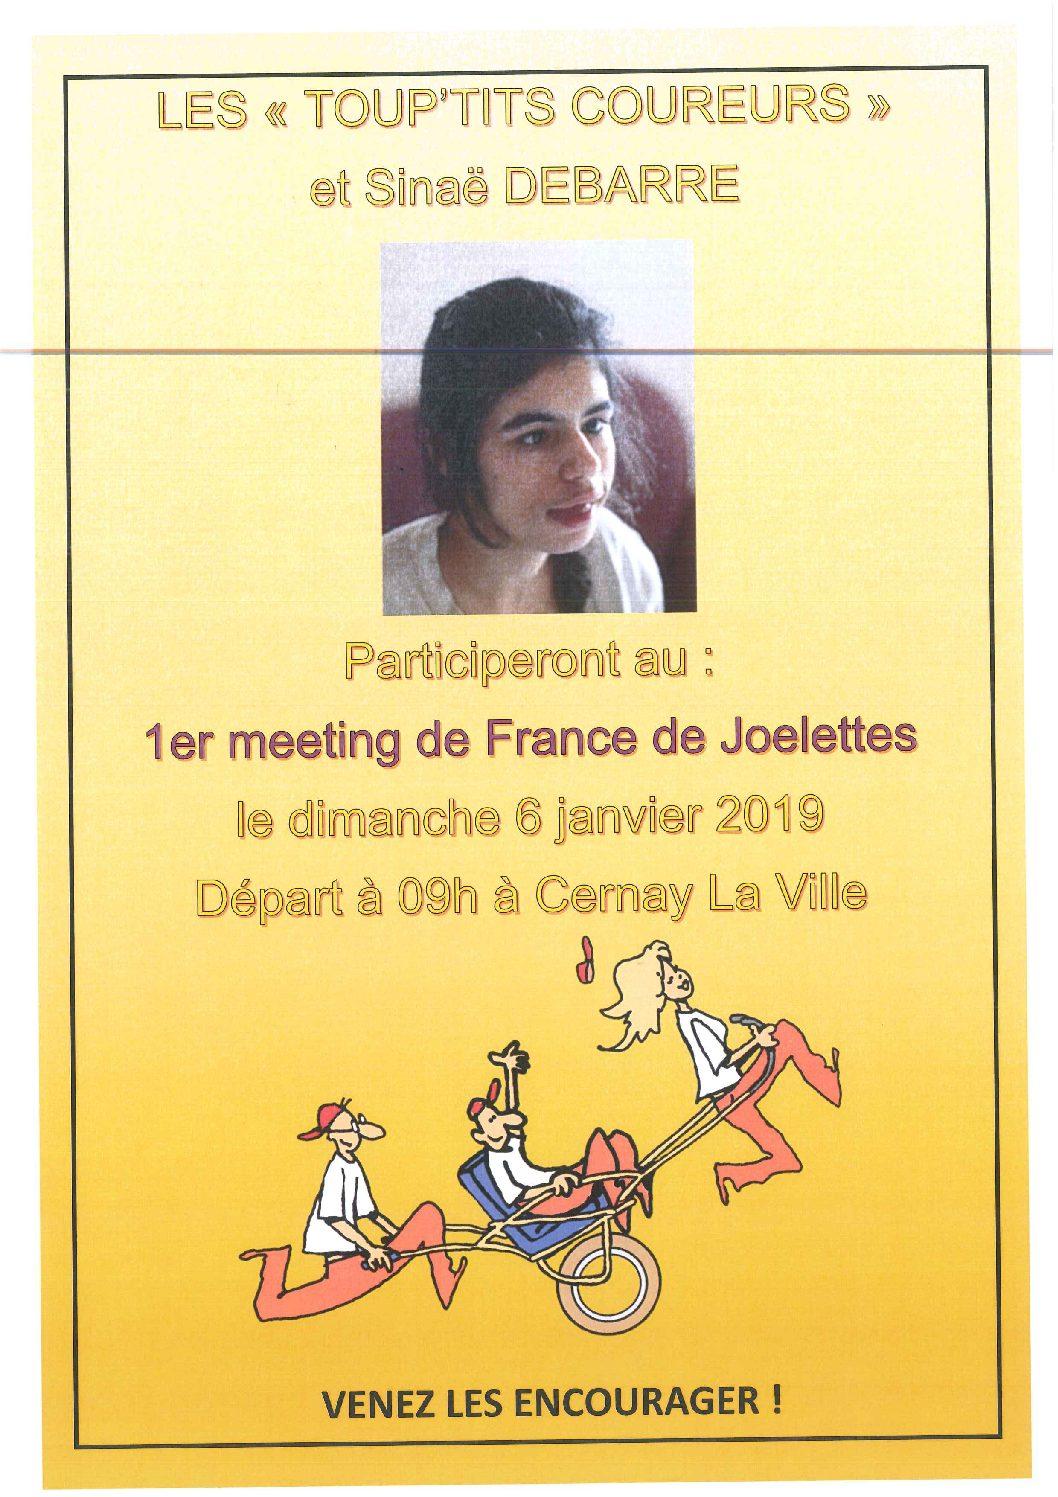 6 janvier 2019 : 1er meeting de France des Joelettes